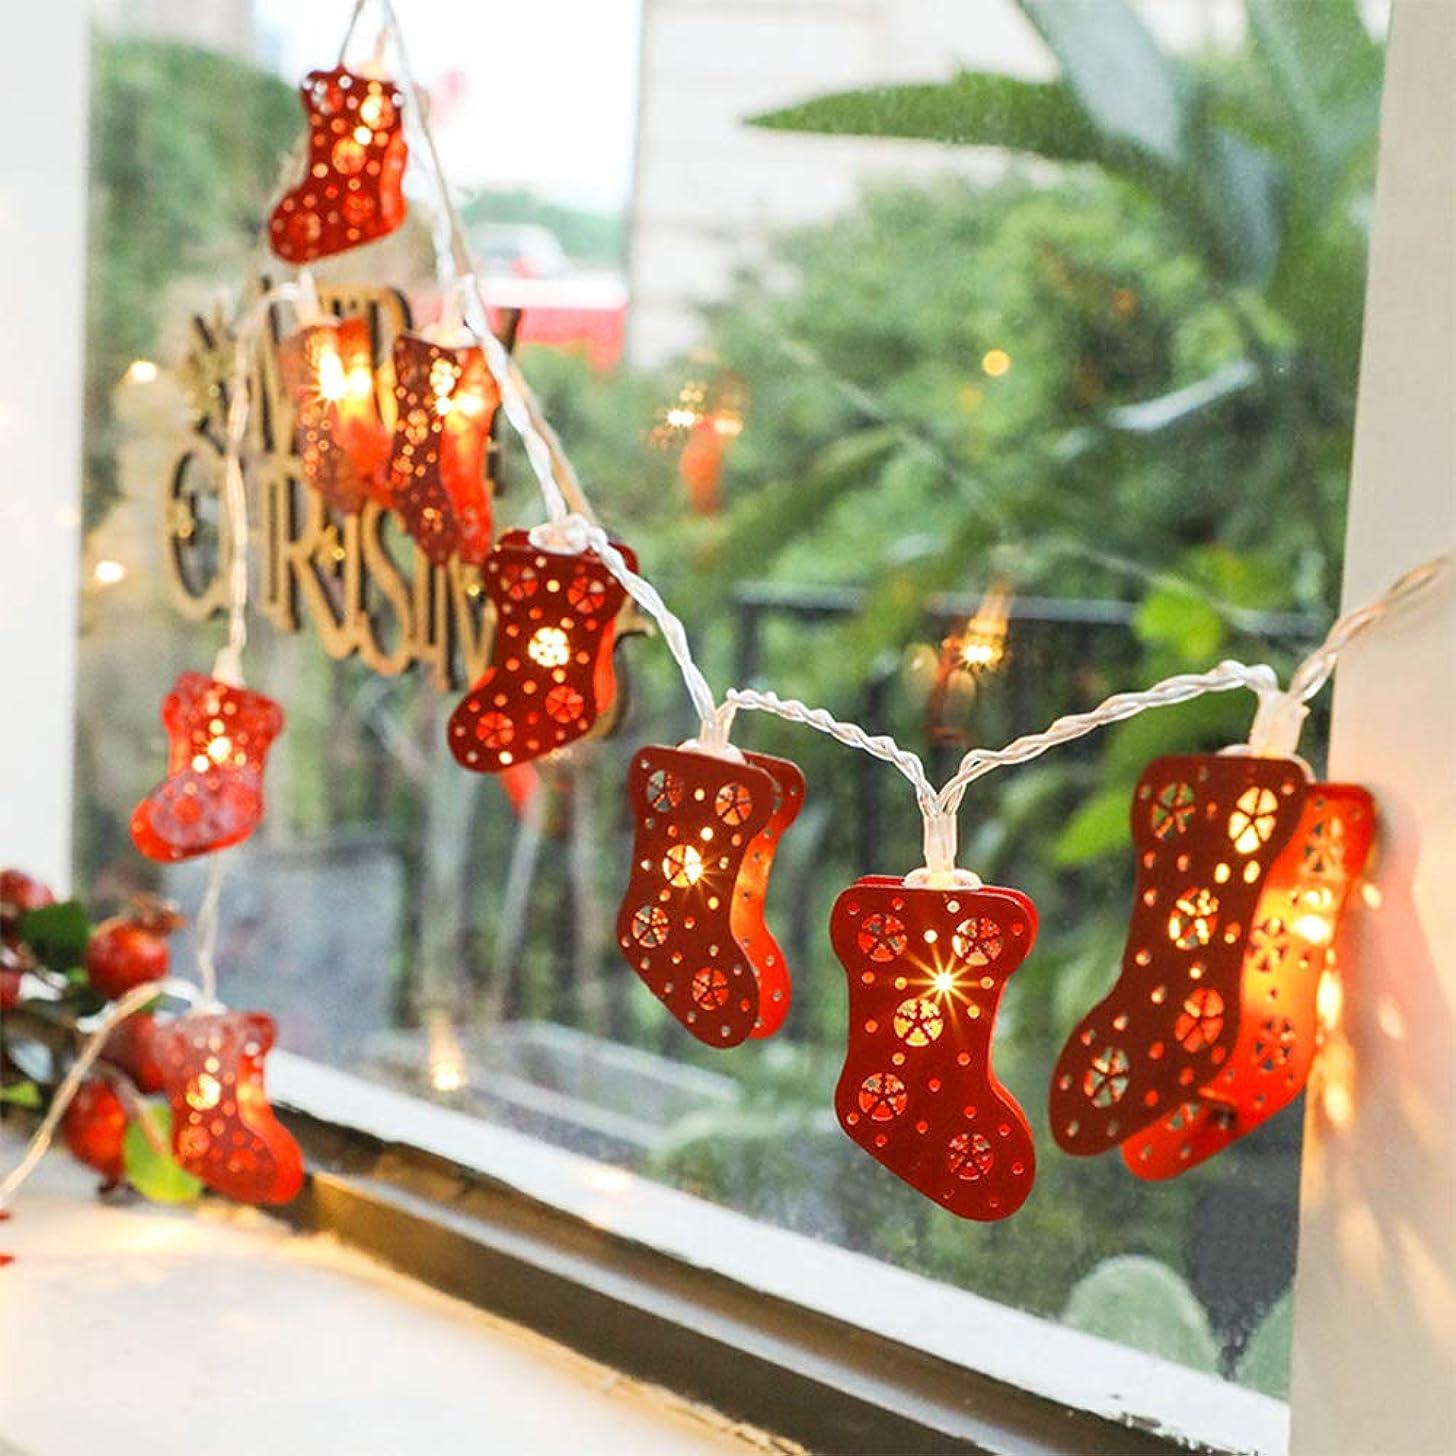 AZX Led Christmas Sock String Light Decorative Battery Operated Xmas Indoor Lights Holiday Festive Fairy Lamp 12V (3 Meter 30 LEDs)